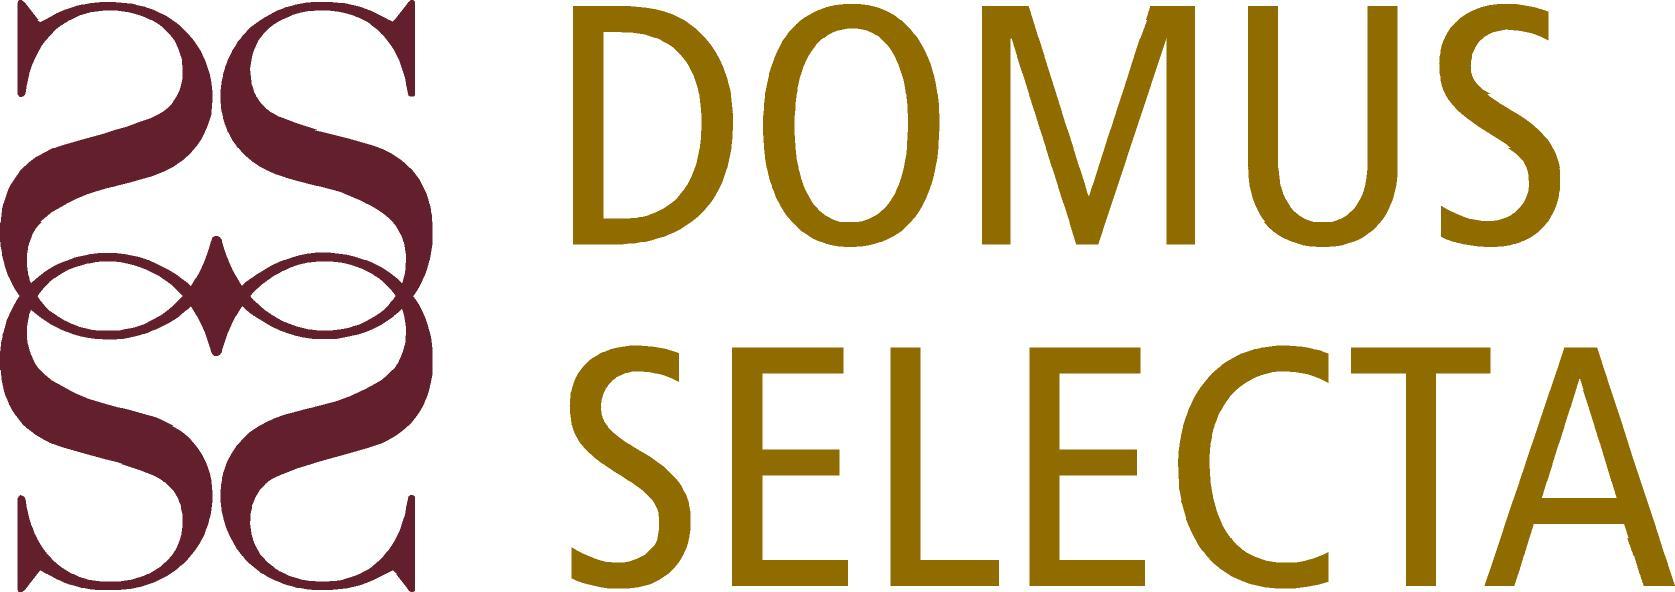 domus-selecta